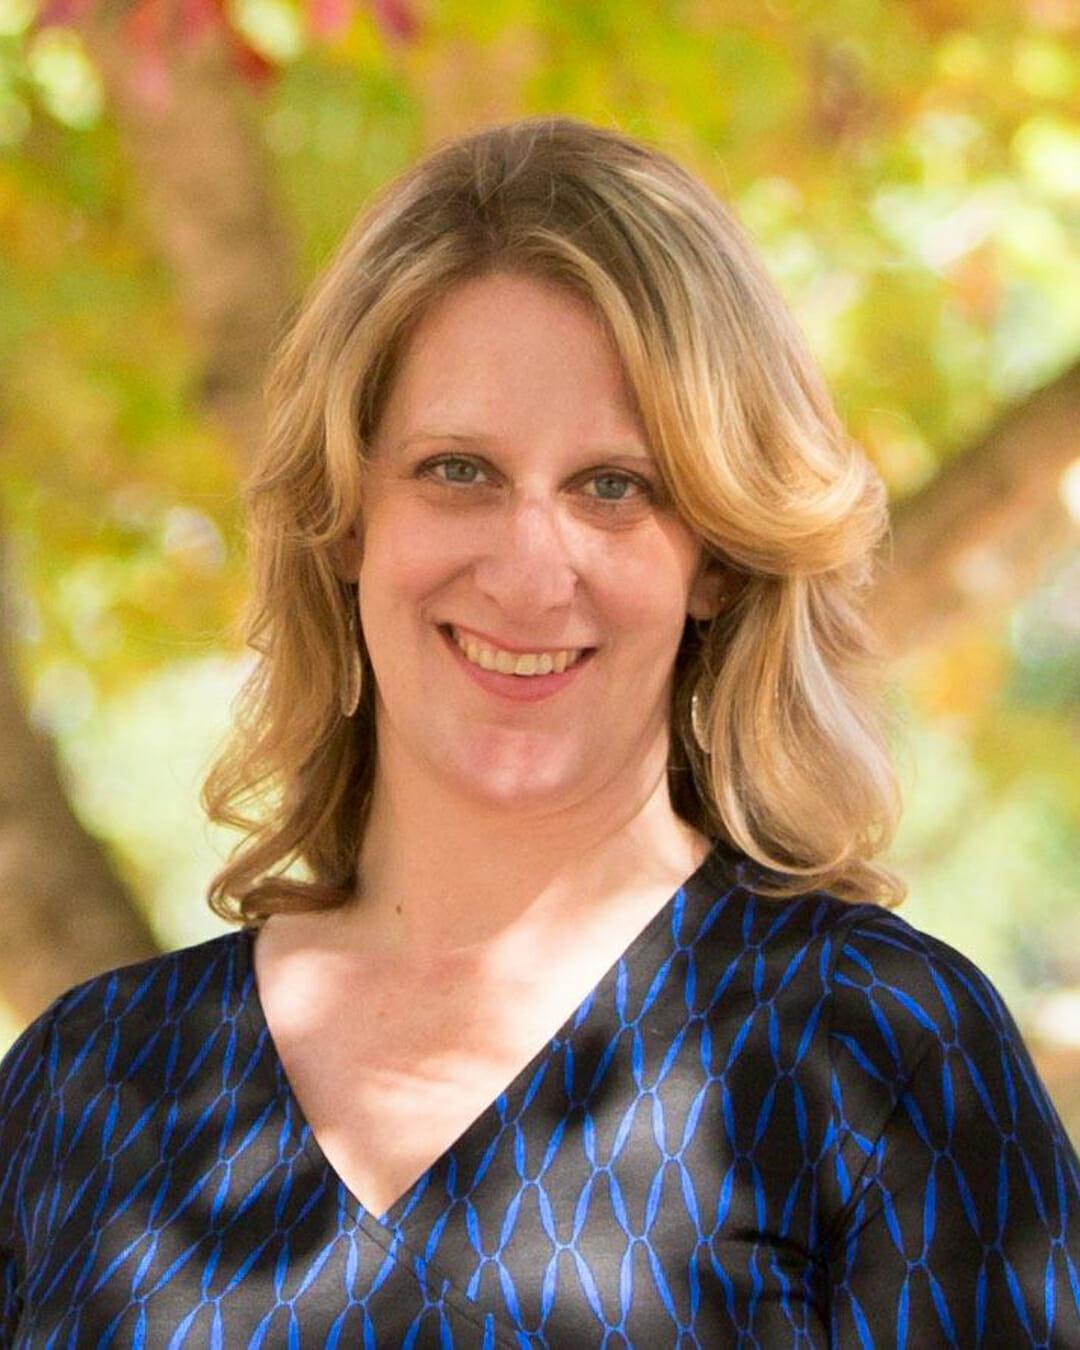 Janet Lawson, RCSD School Board Member